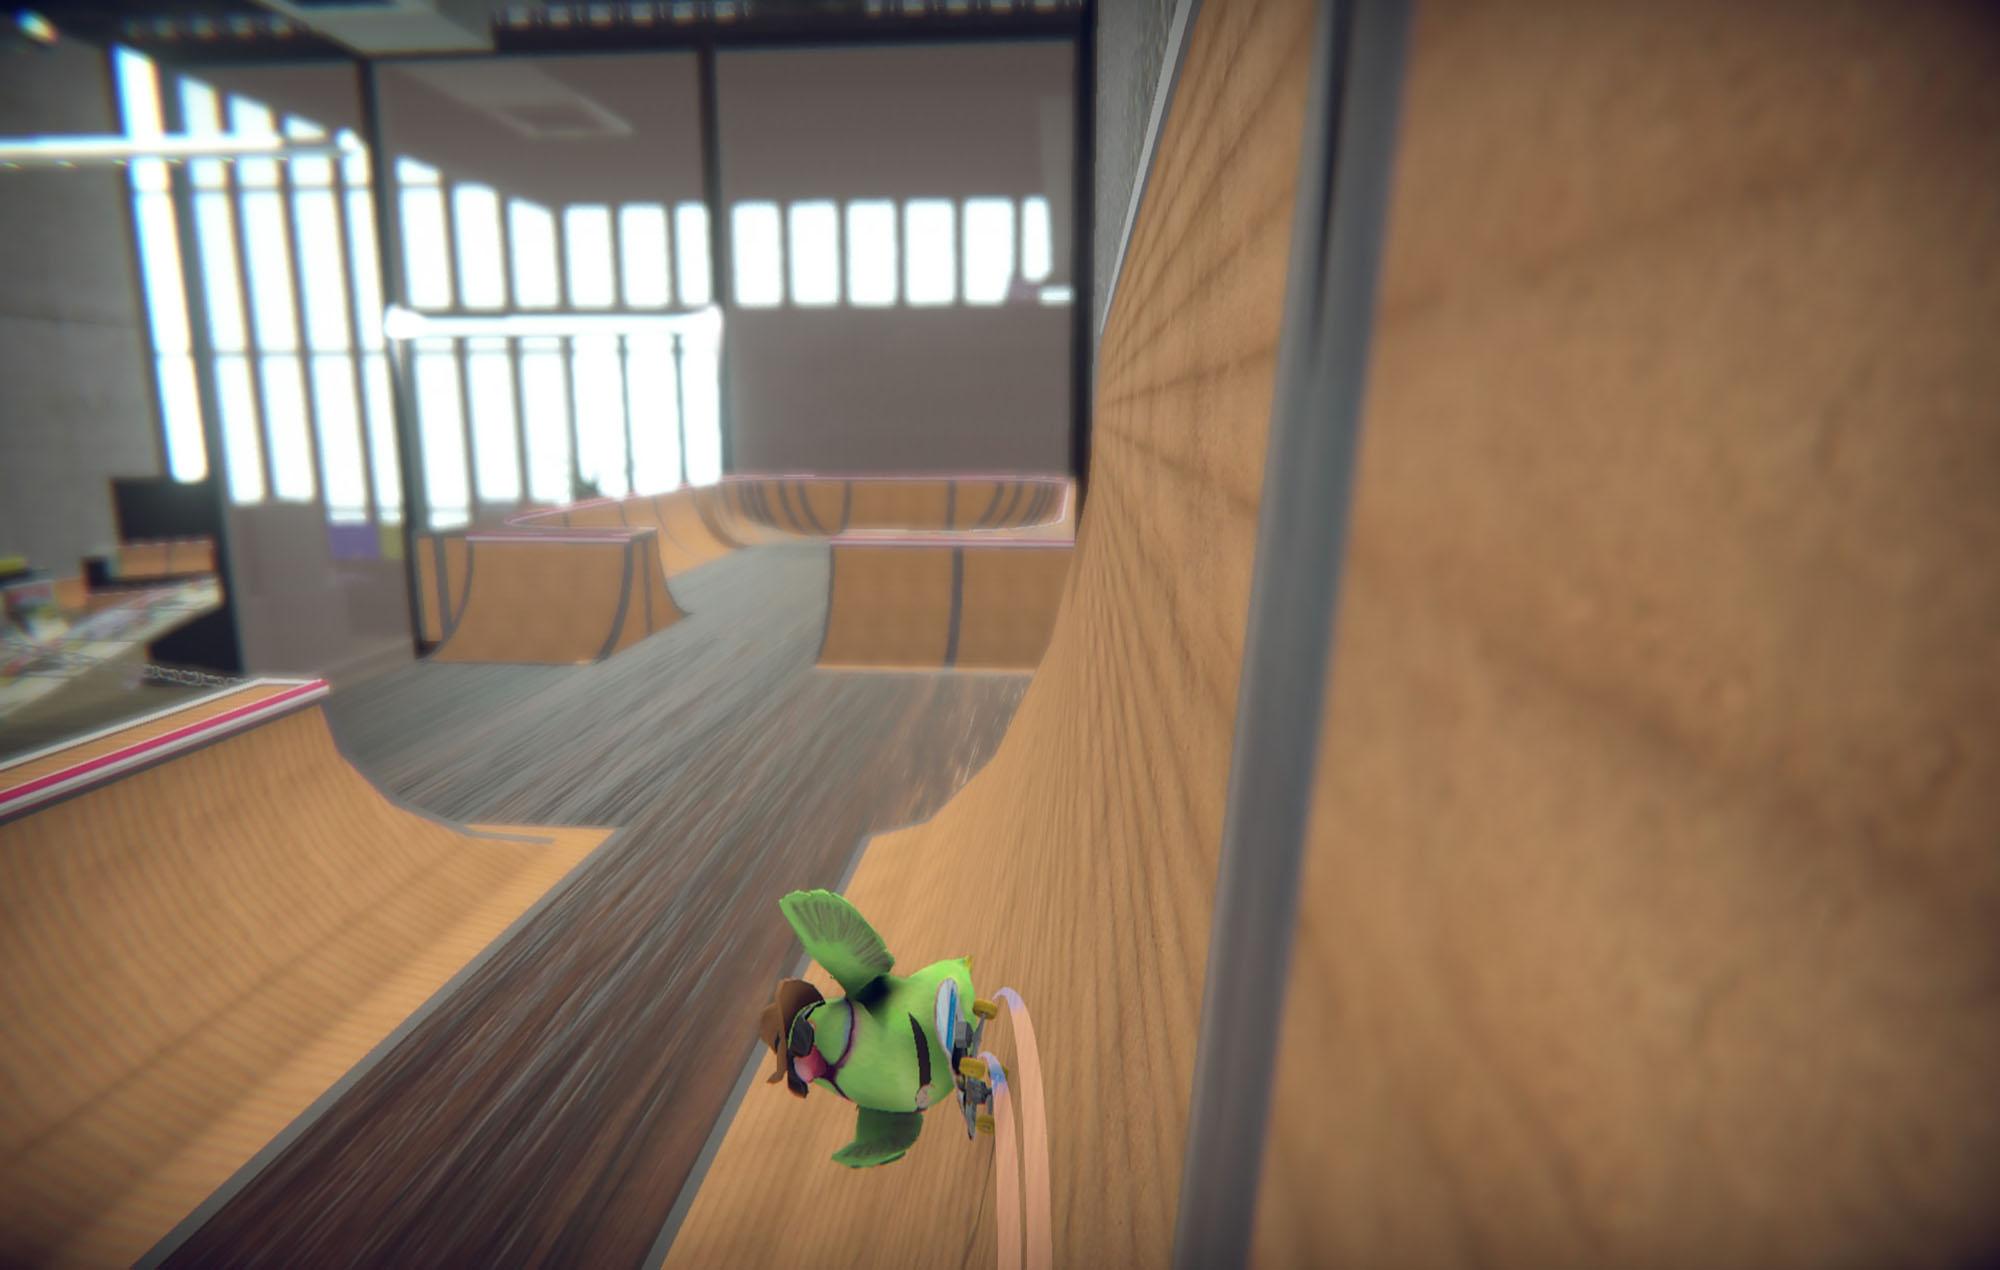 Skatebird. Image Credit: Glass Bottom Games